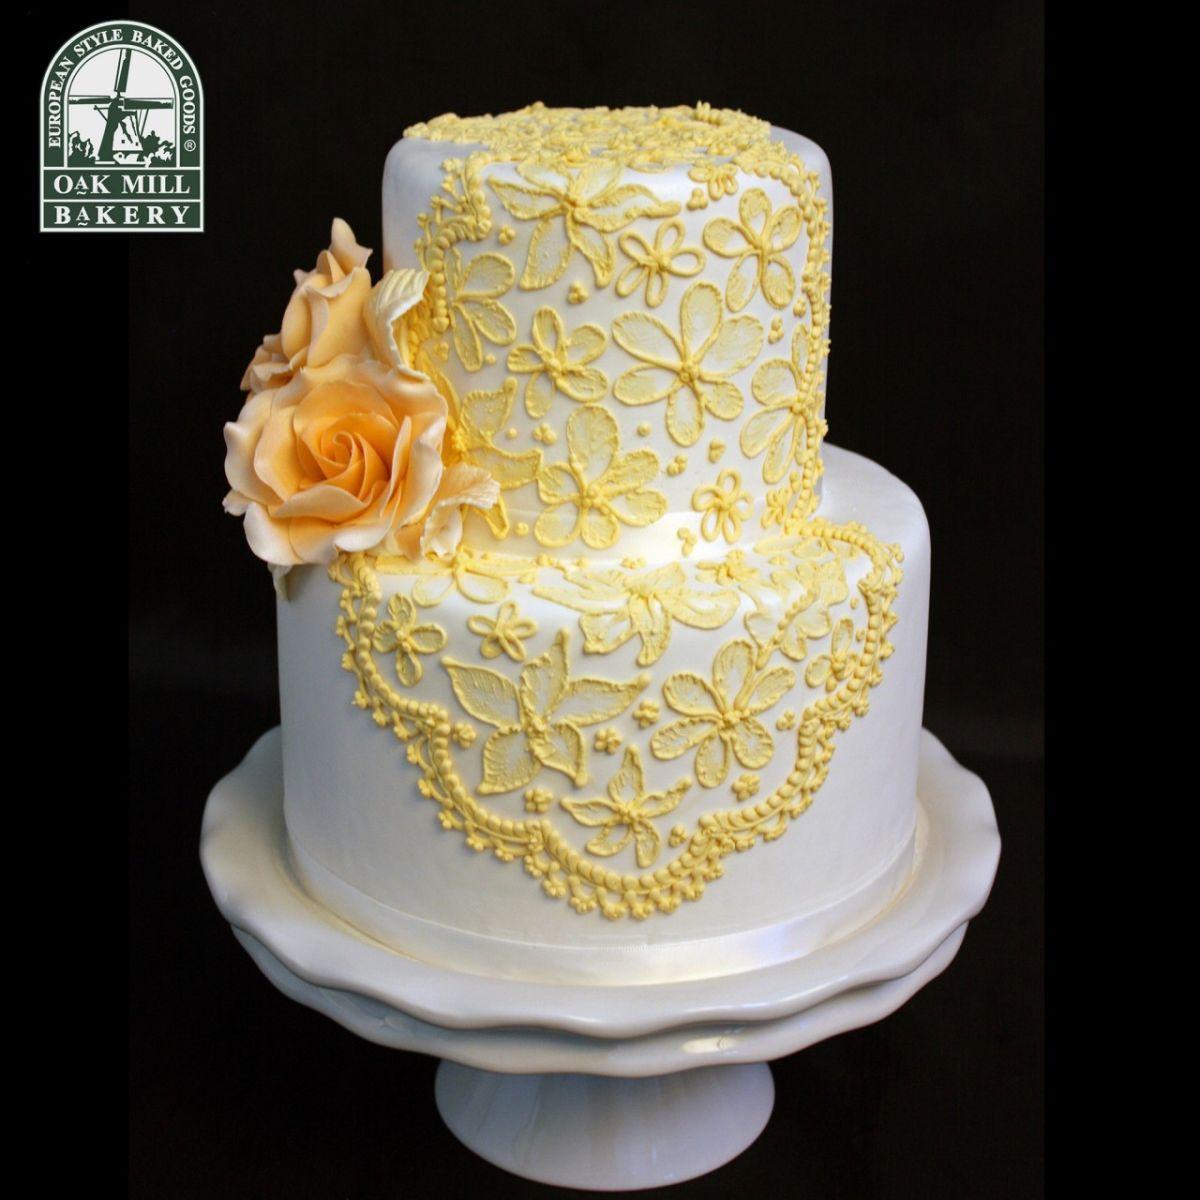 18 Wedding Cake Designs to Steal | AllFreeDIYWeddings.com